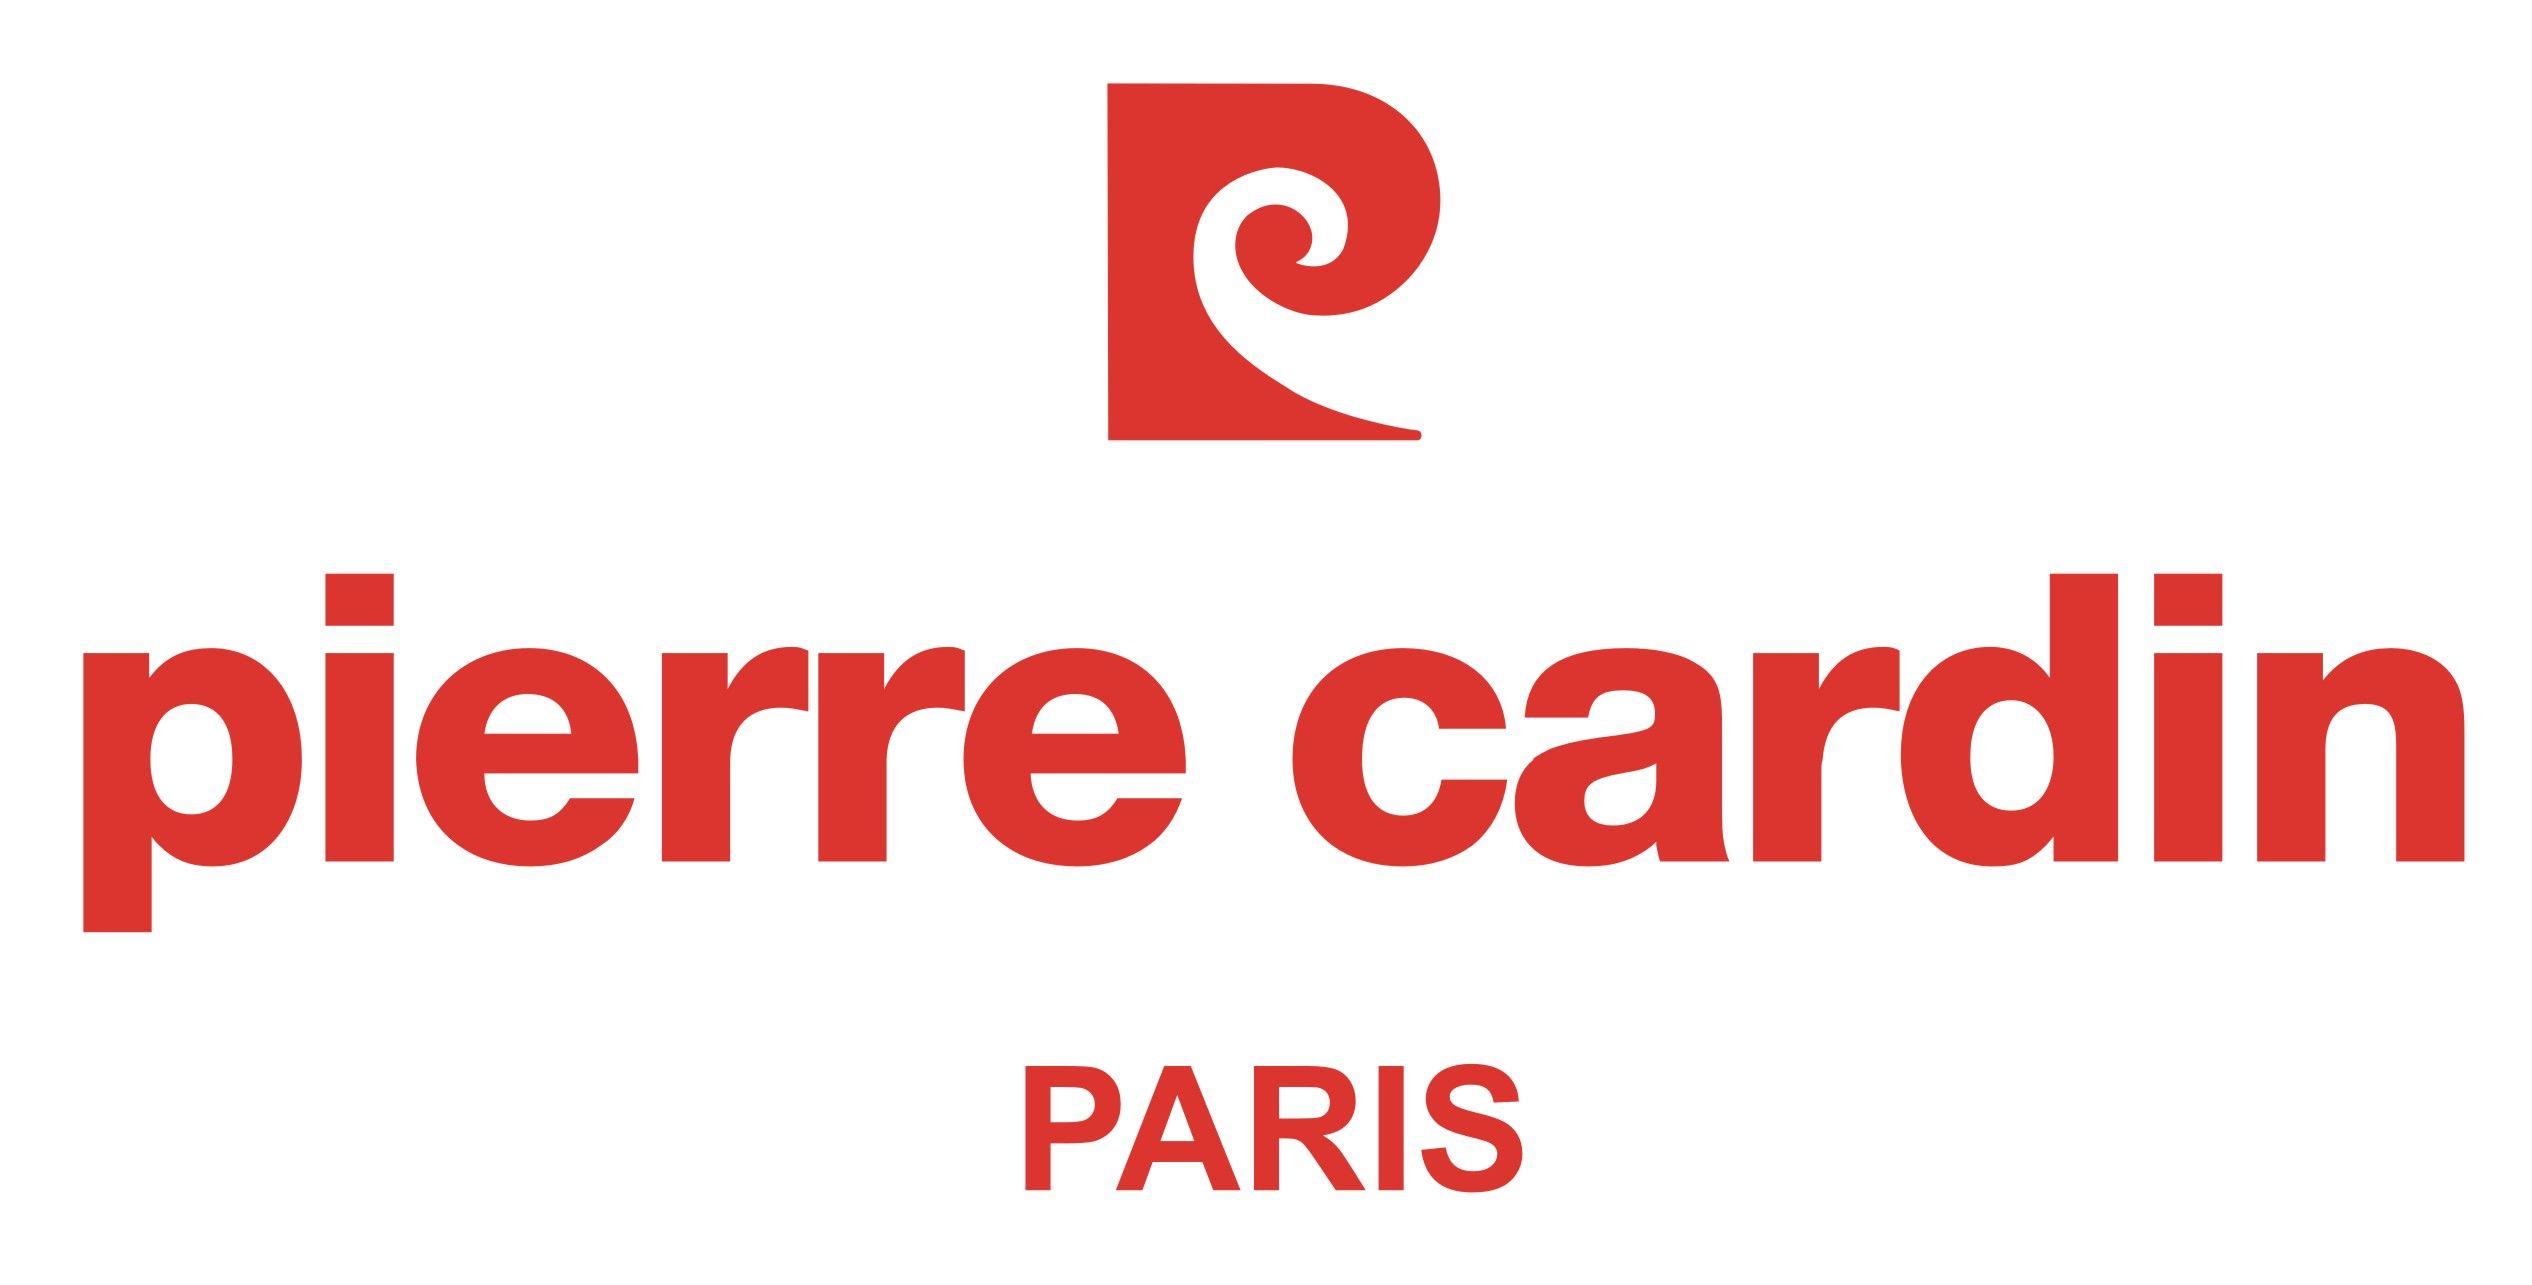 image result for pierre cardin logo pierre cardin pierre cardin  image result for pierre cardin logo